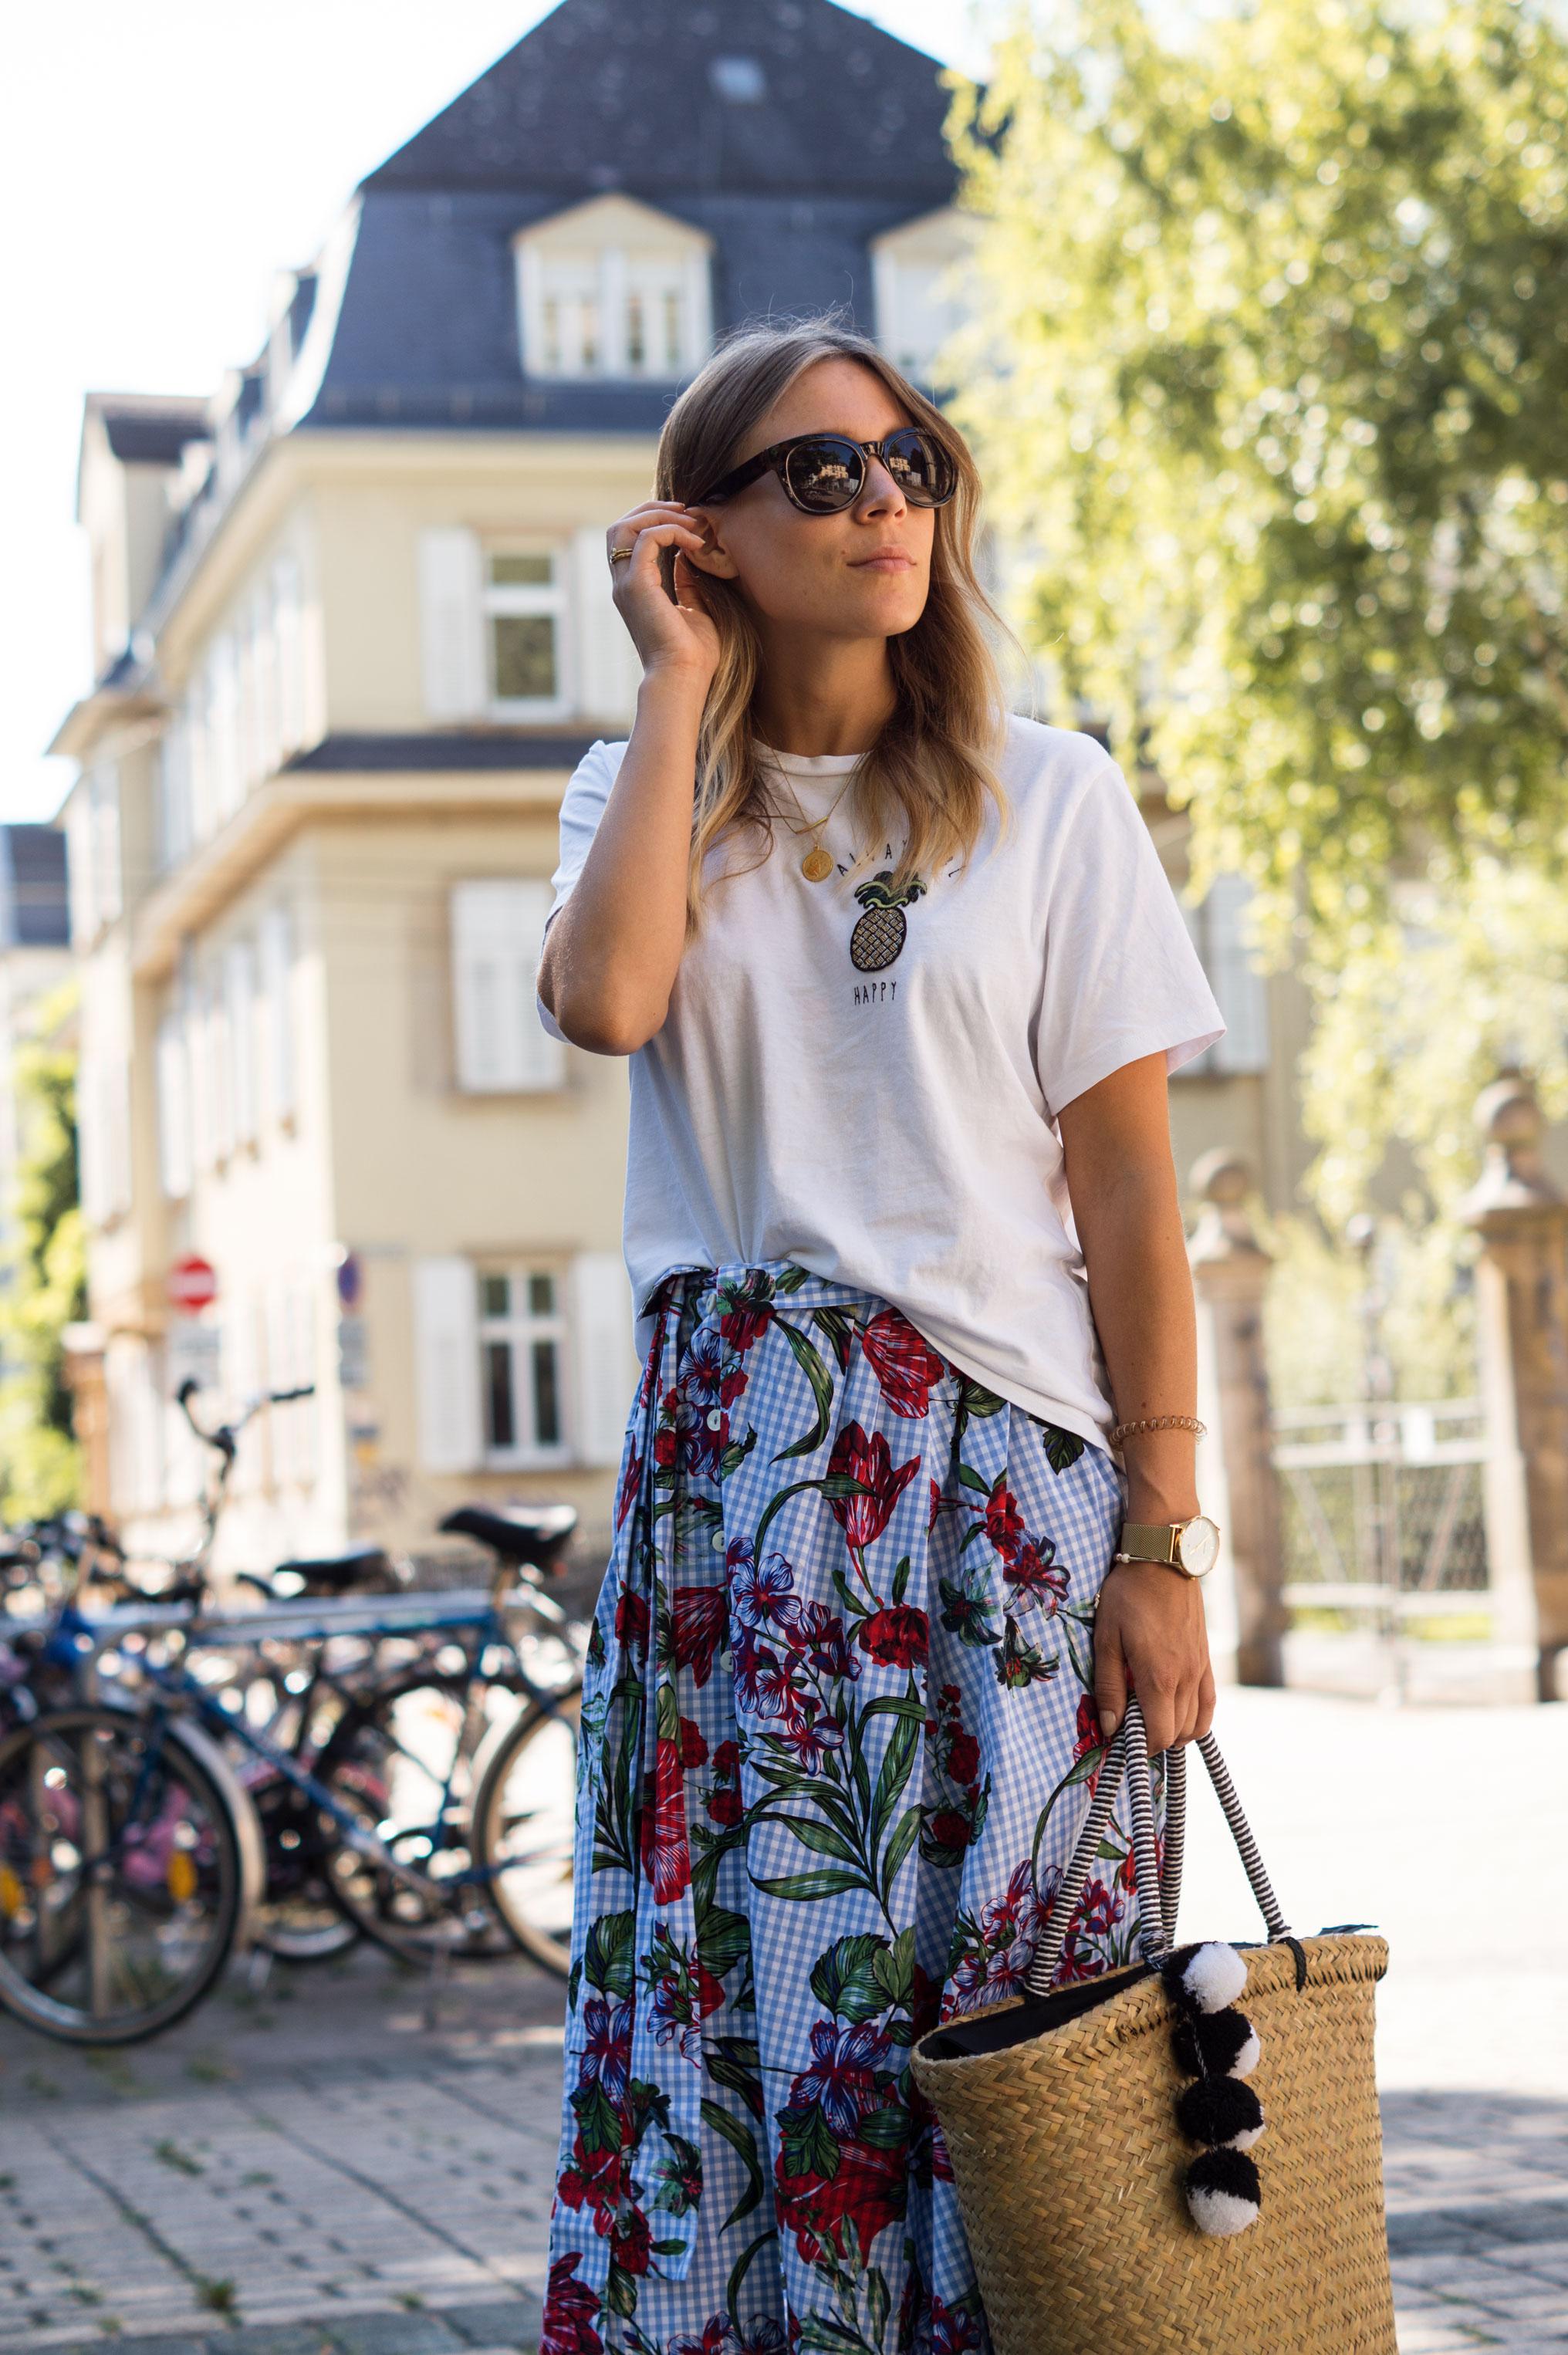 Zara Midi Skirt Ginham Floral Print Blumenmuster karierter Rock Print Shirt Manfield Mules Sariety Summer Shopping Look_1